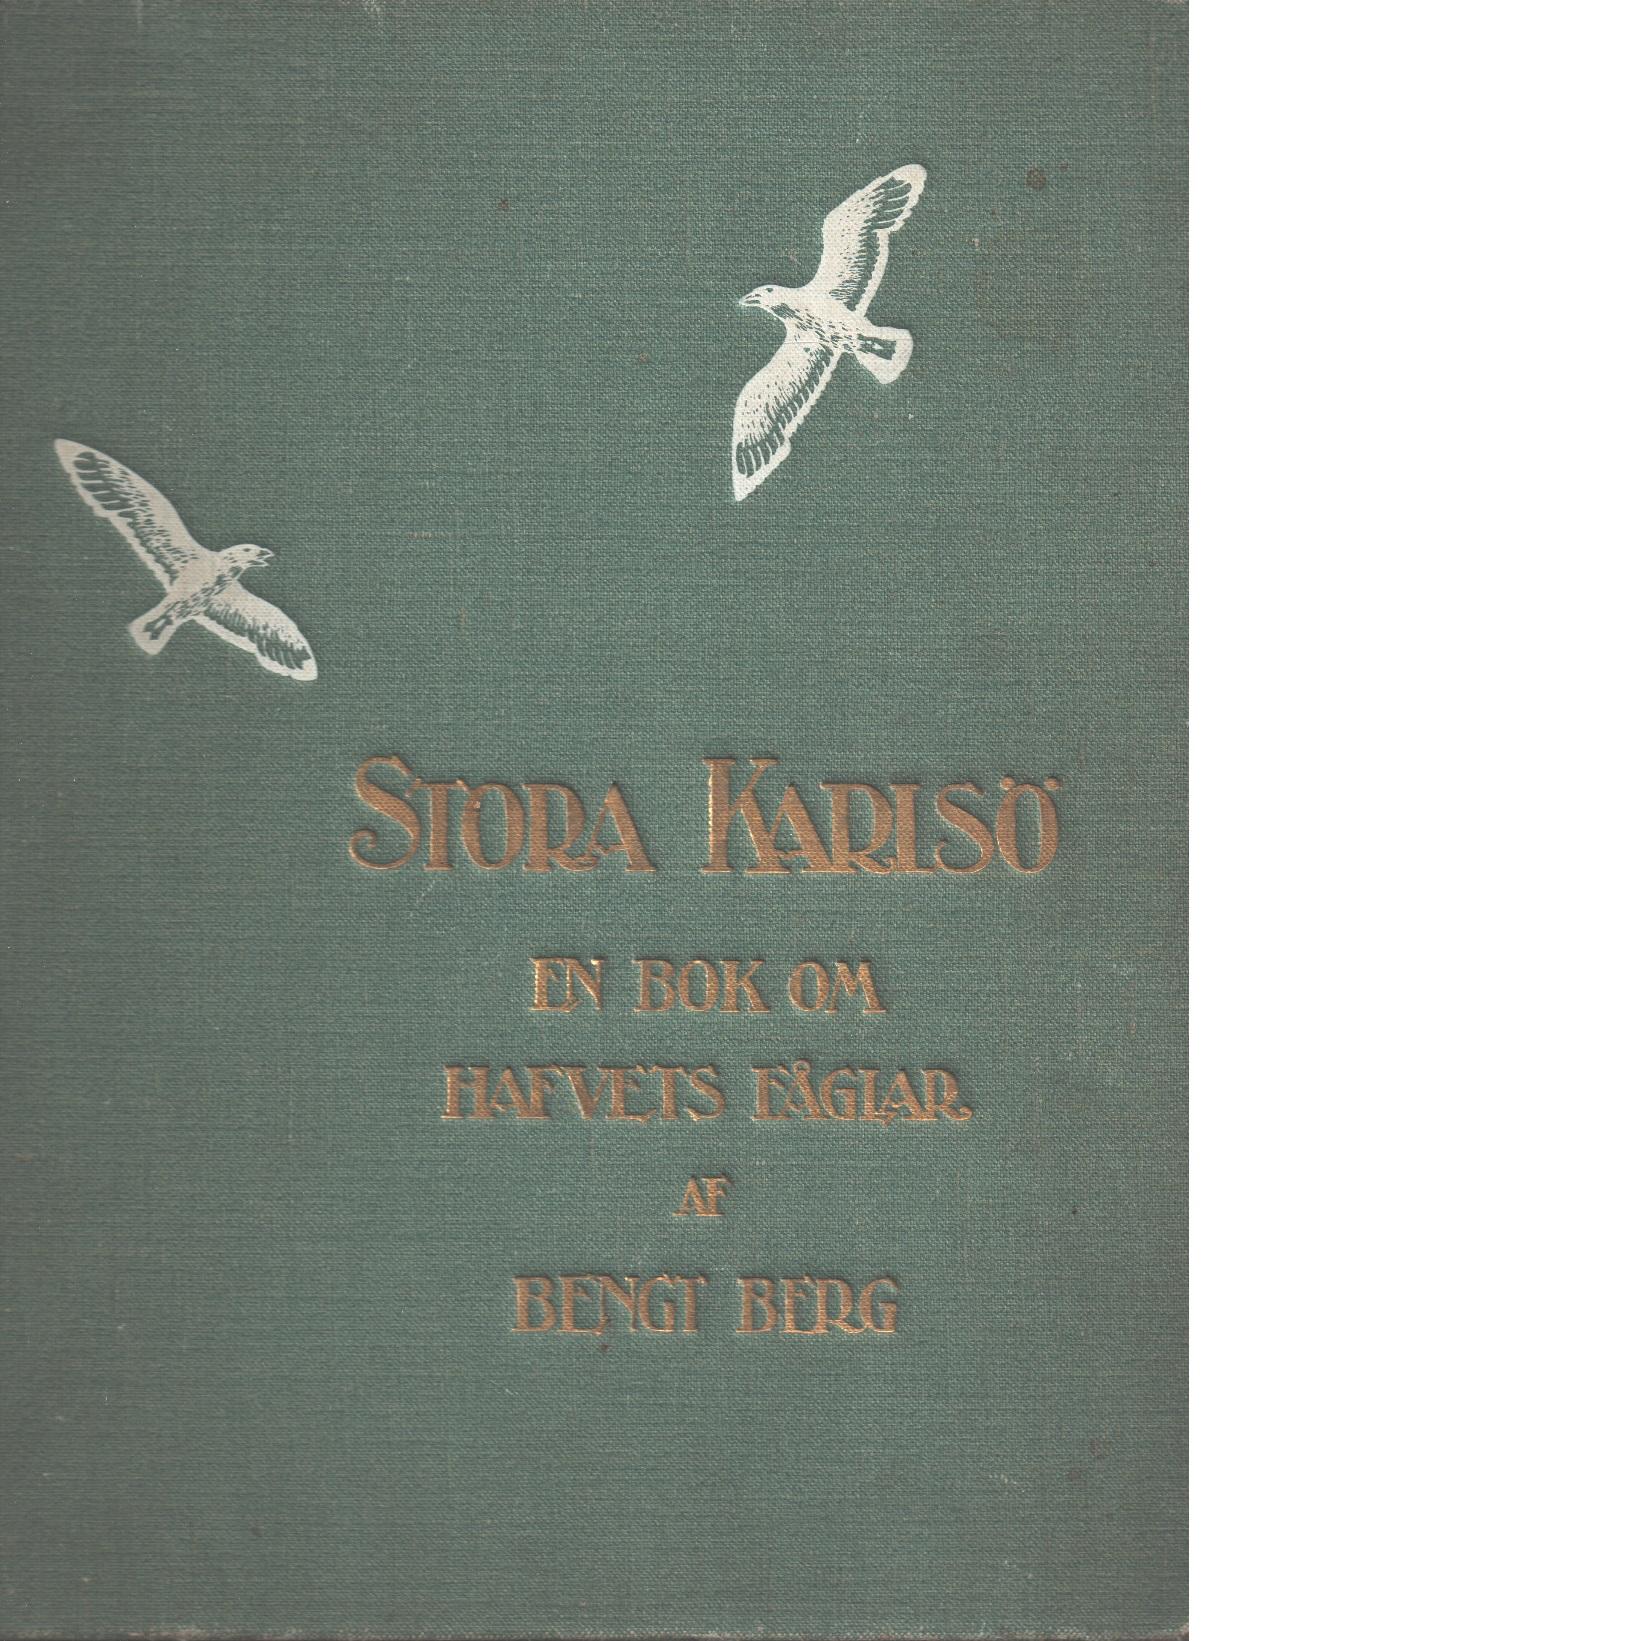 Stora Karlsö : en bok om hafvets fåglar - Berg, Bengt